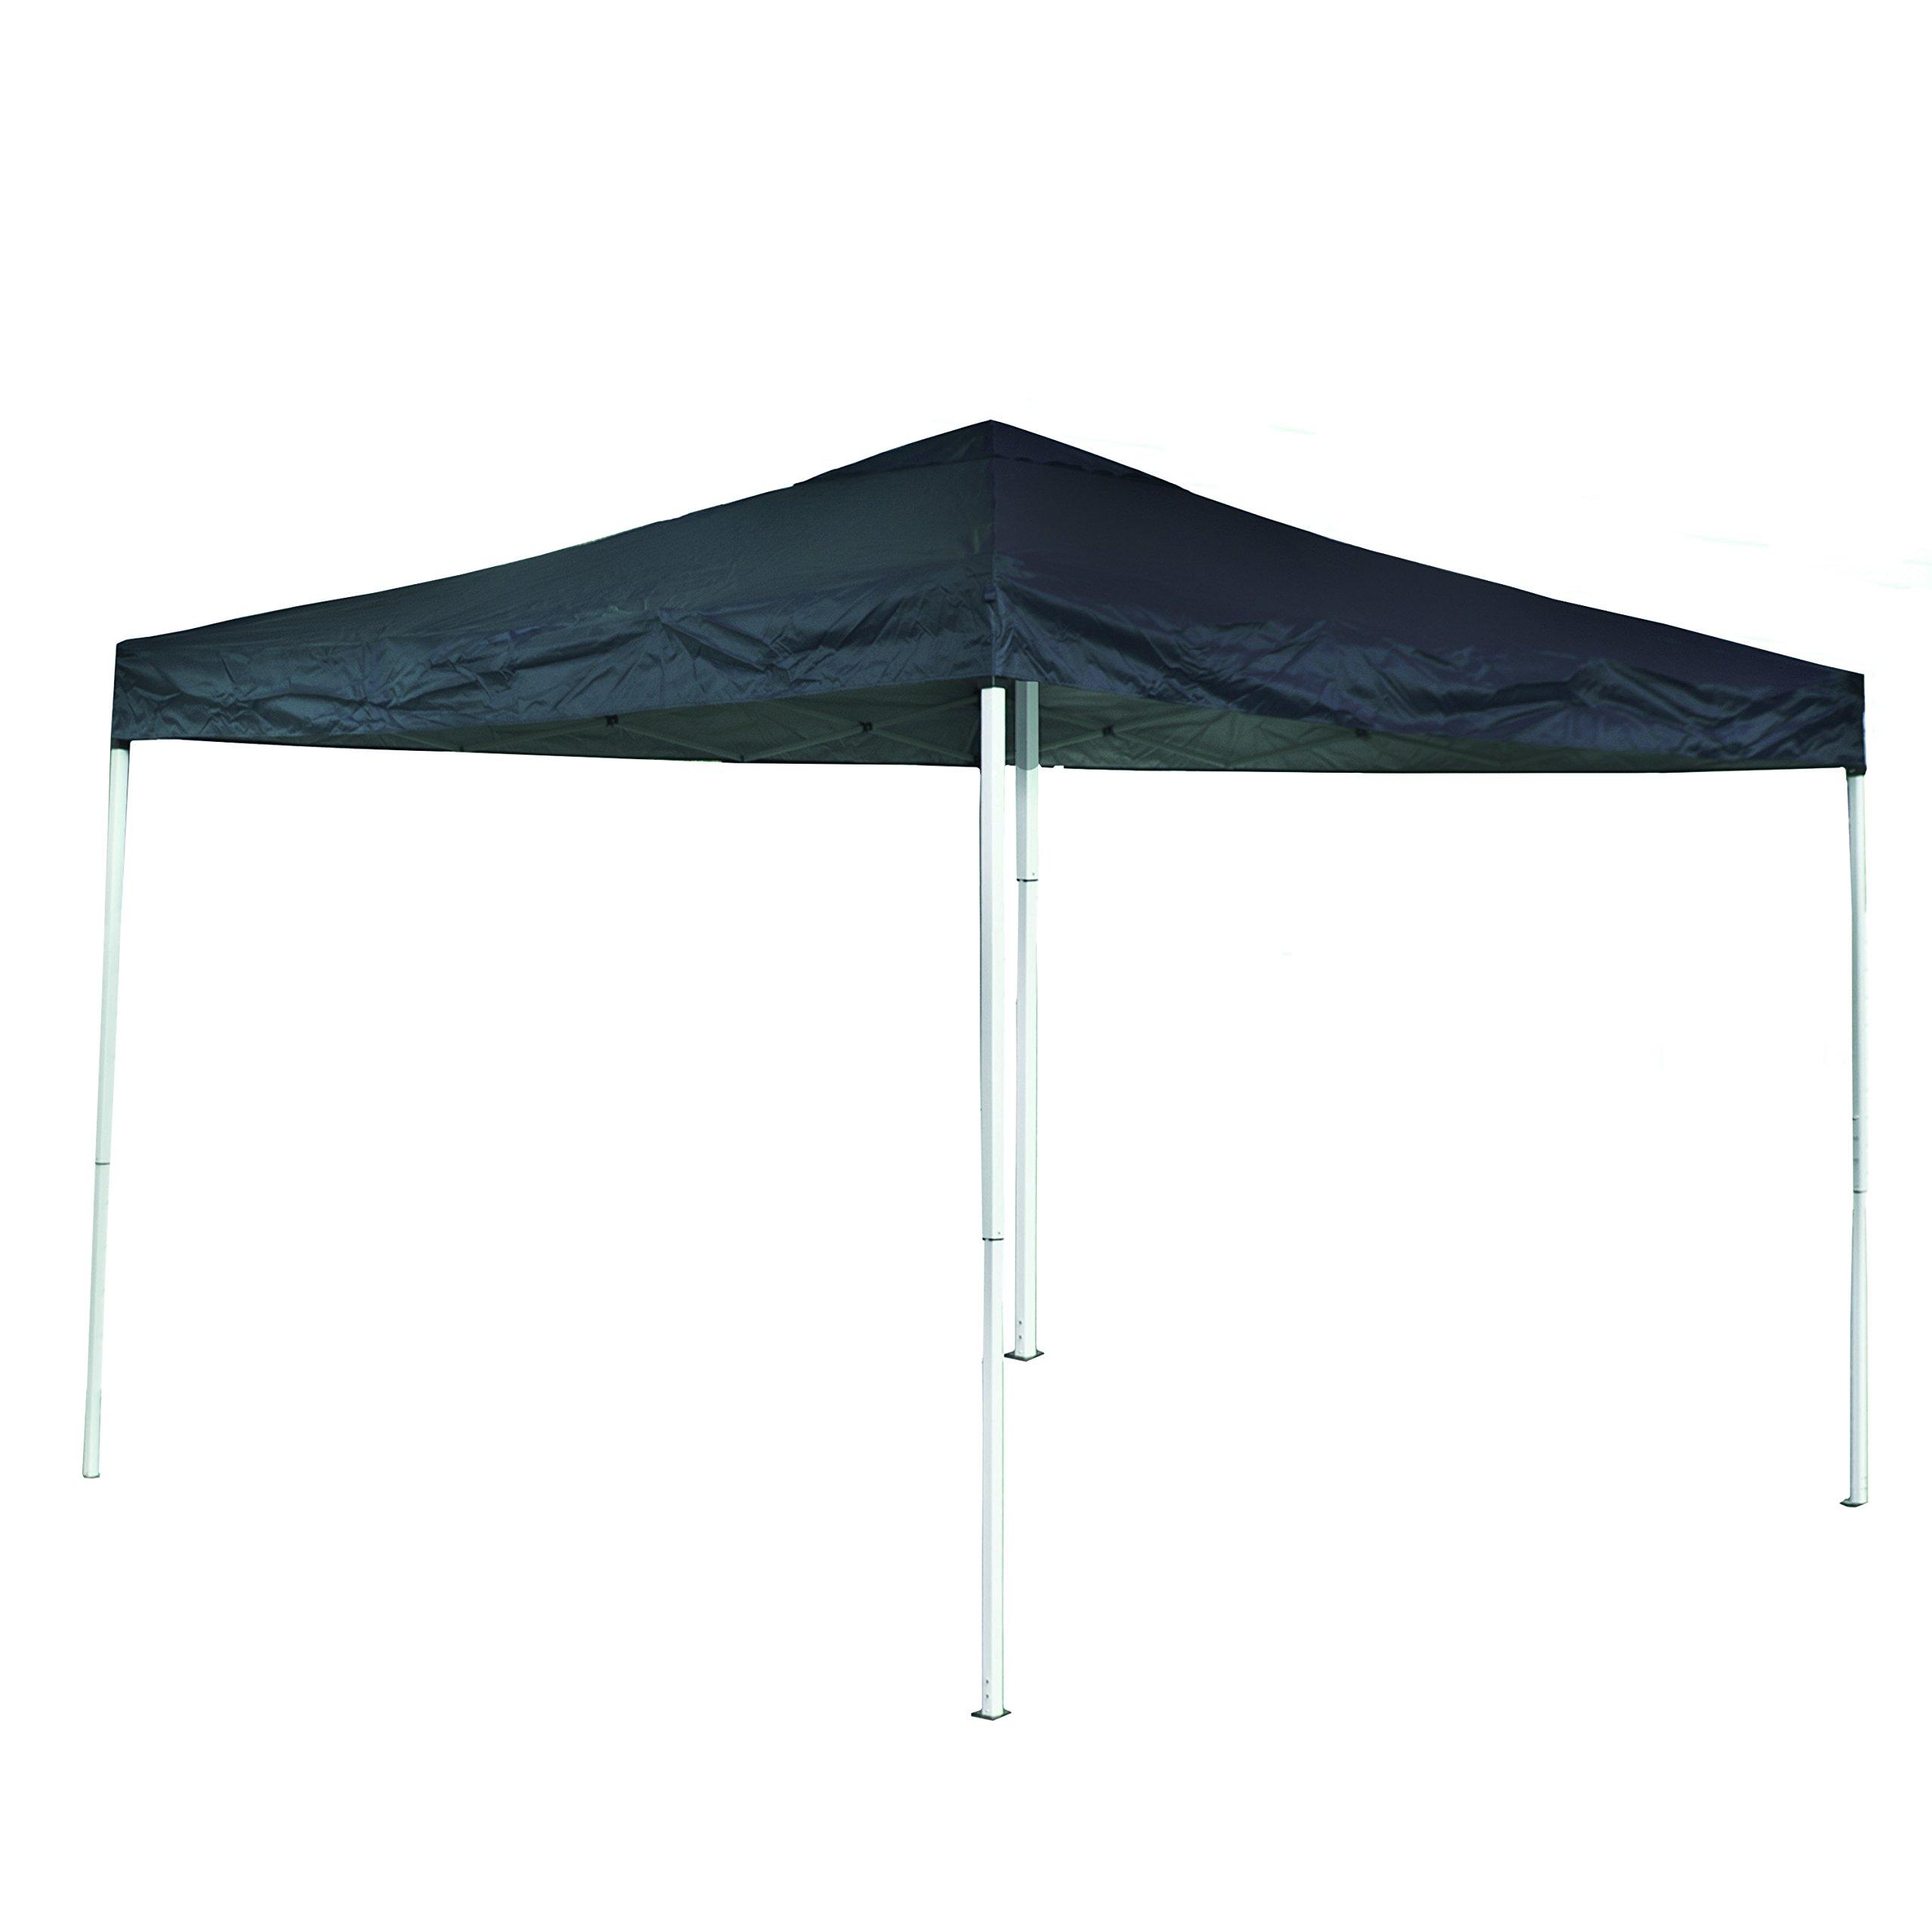 ALEKO GAZF10X13B Foldable Popup Polyester Gazebo Canopy Patio Coffee Shelter 10 x 13 Feet Blue